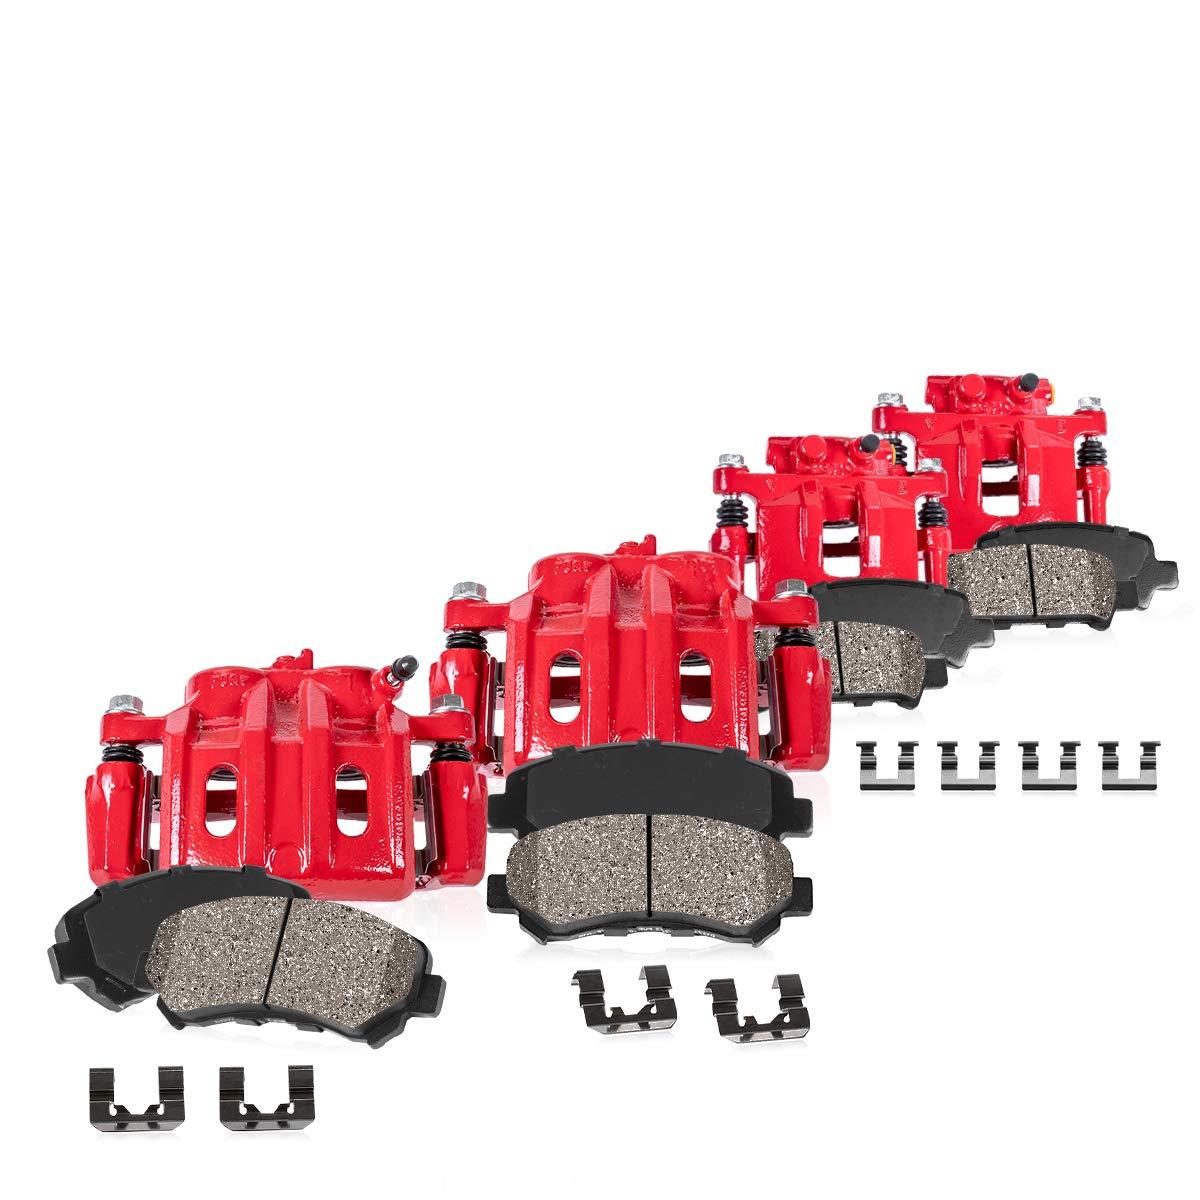 for Chevrolet GMC FRONT 4 REAR Premium Performance Brake Calipers Hardware Ceramic Pads Callahan CCK07368